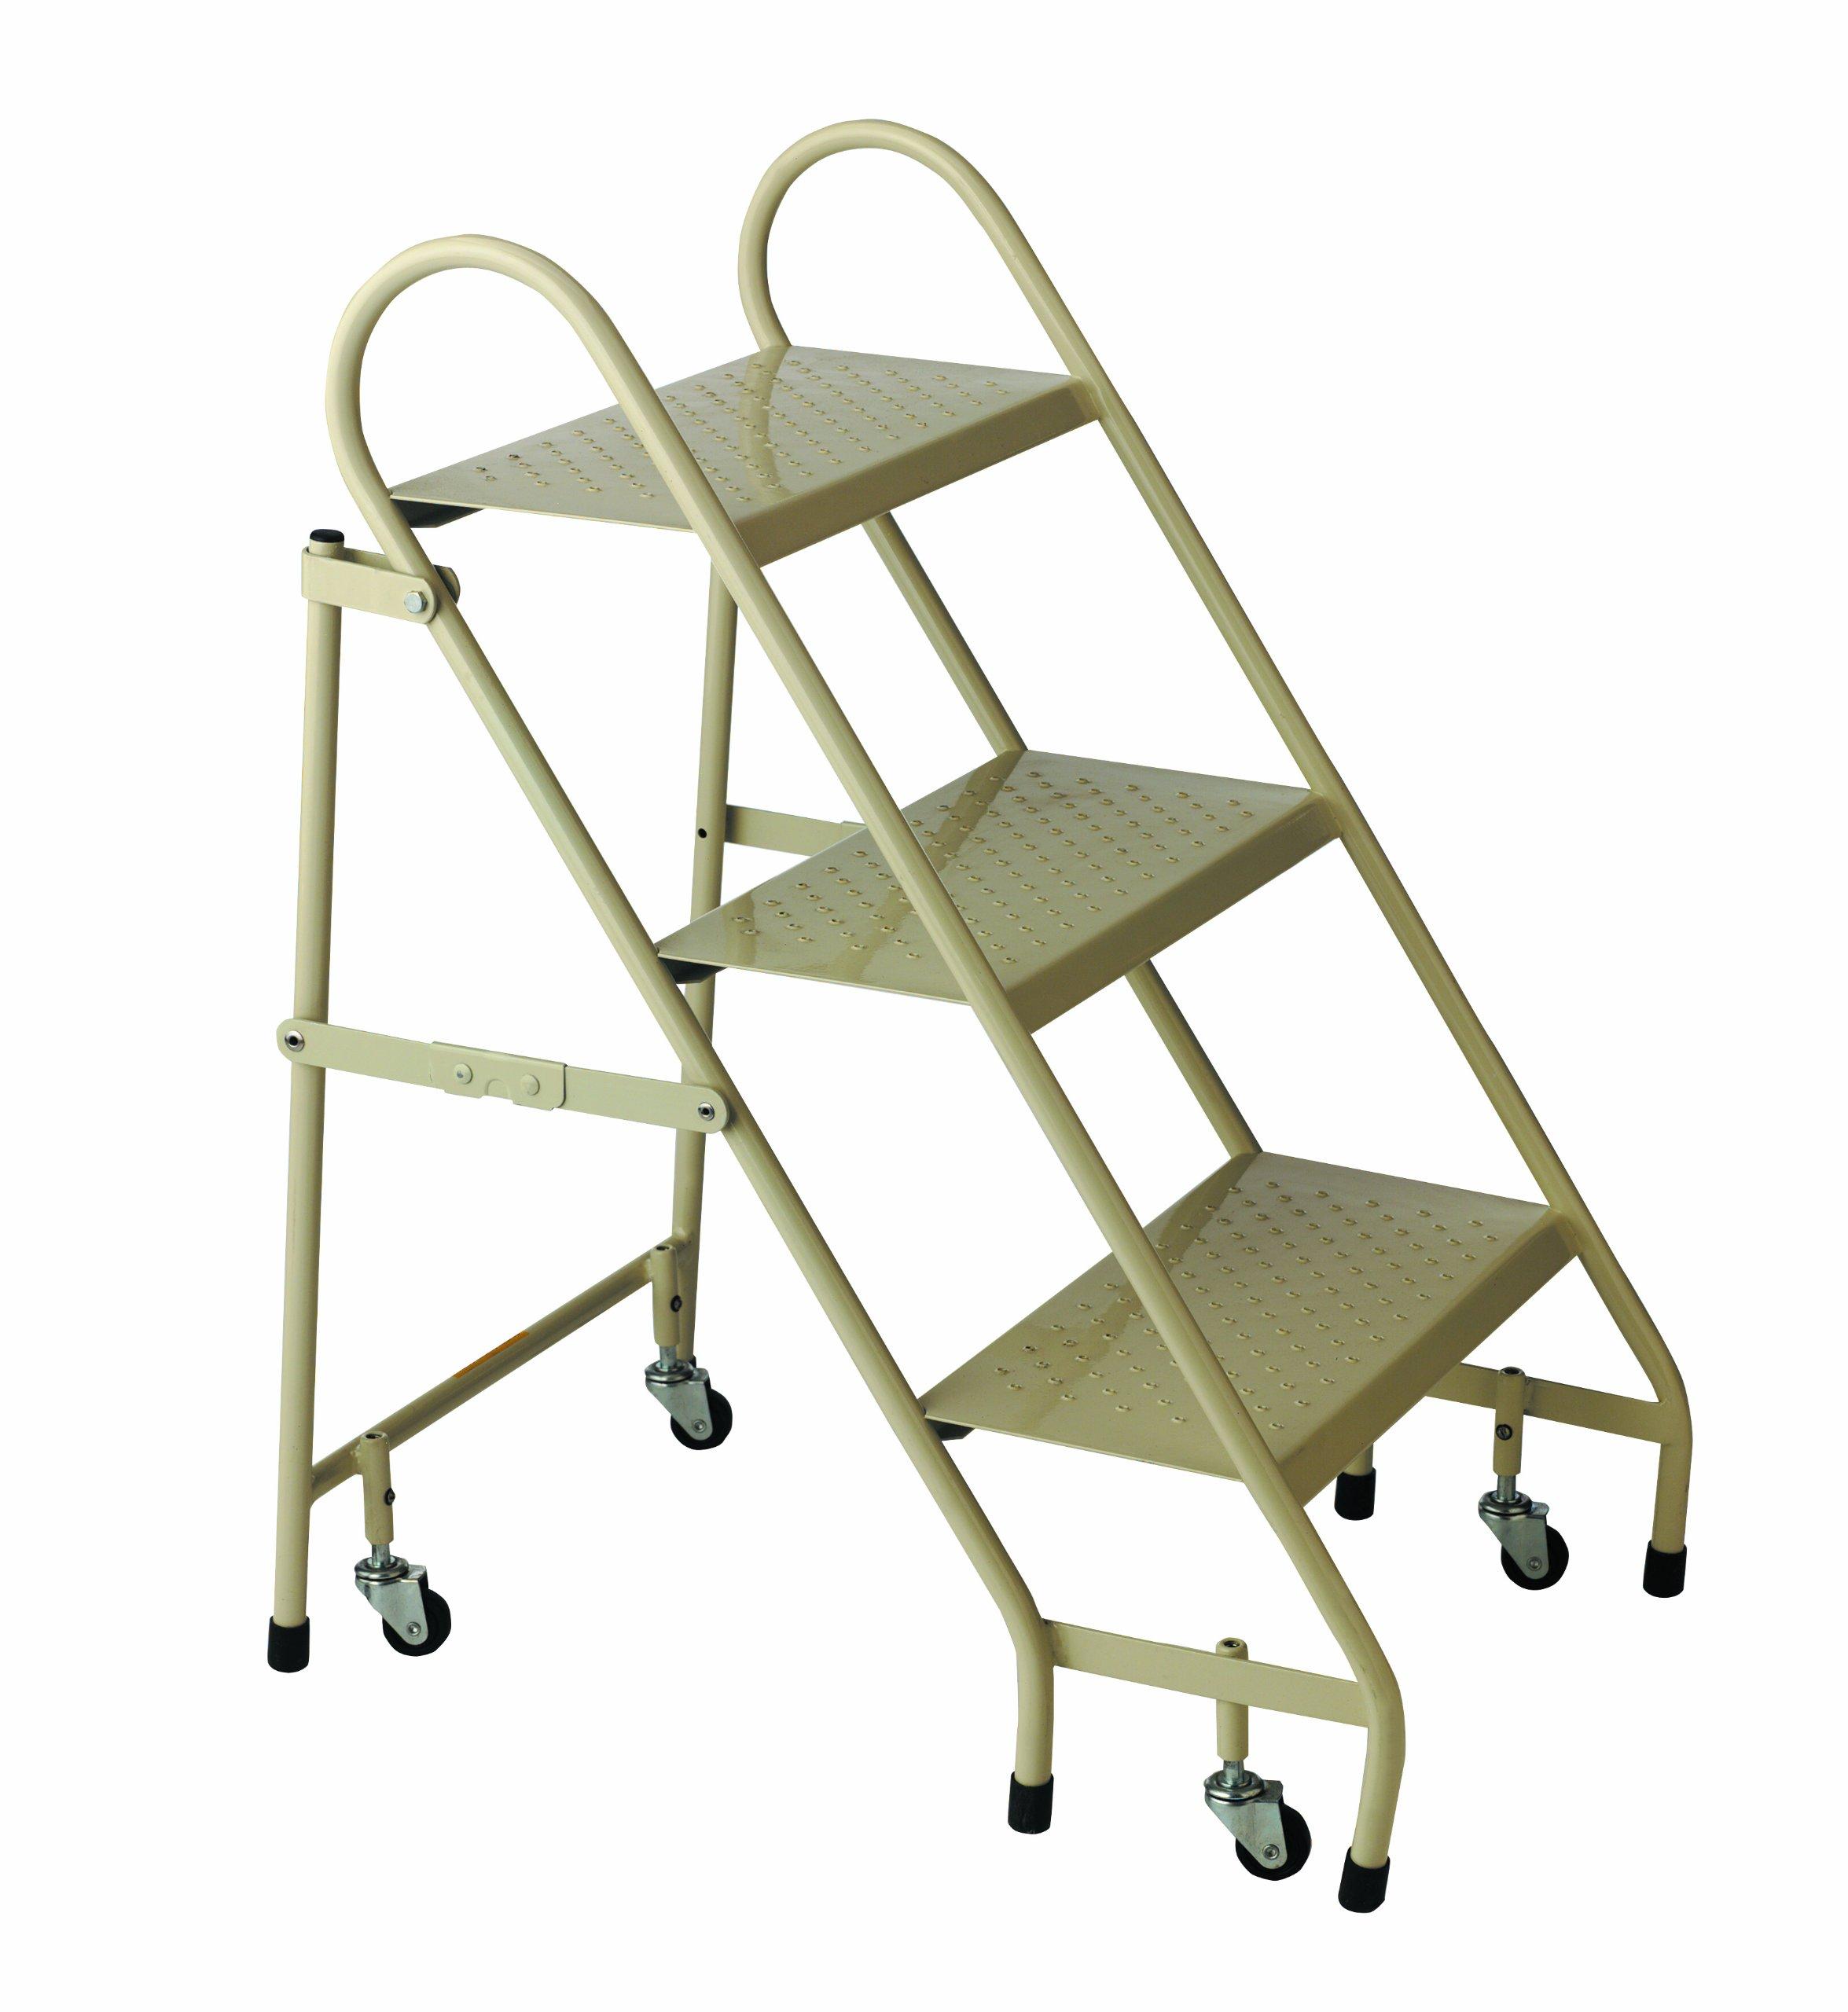 Cramer 1130-19 Steel Folding Ladder, Beige